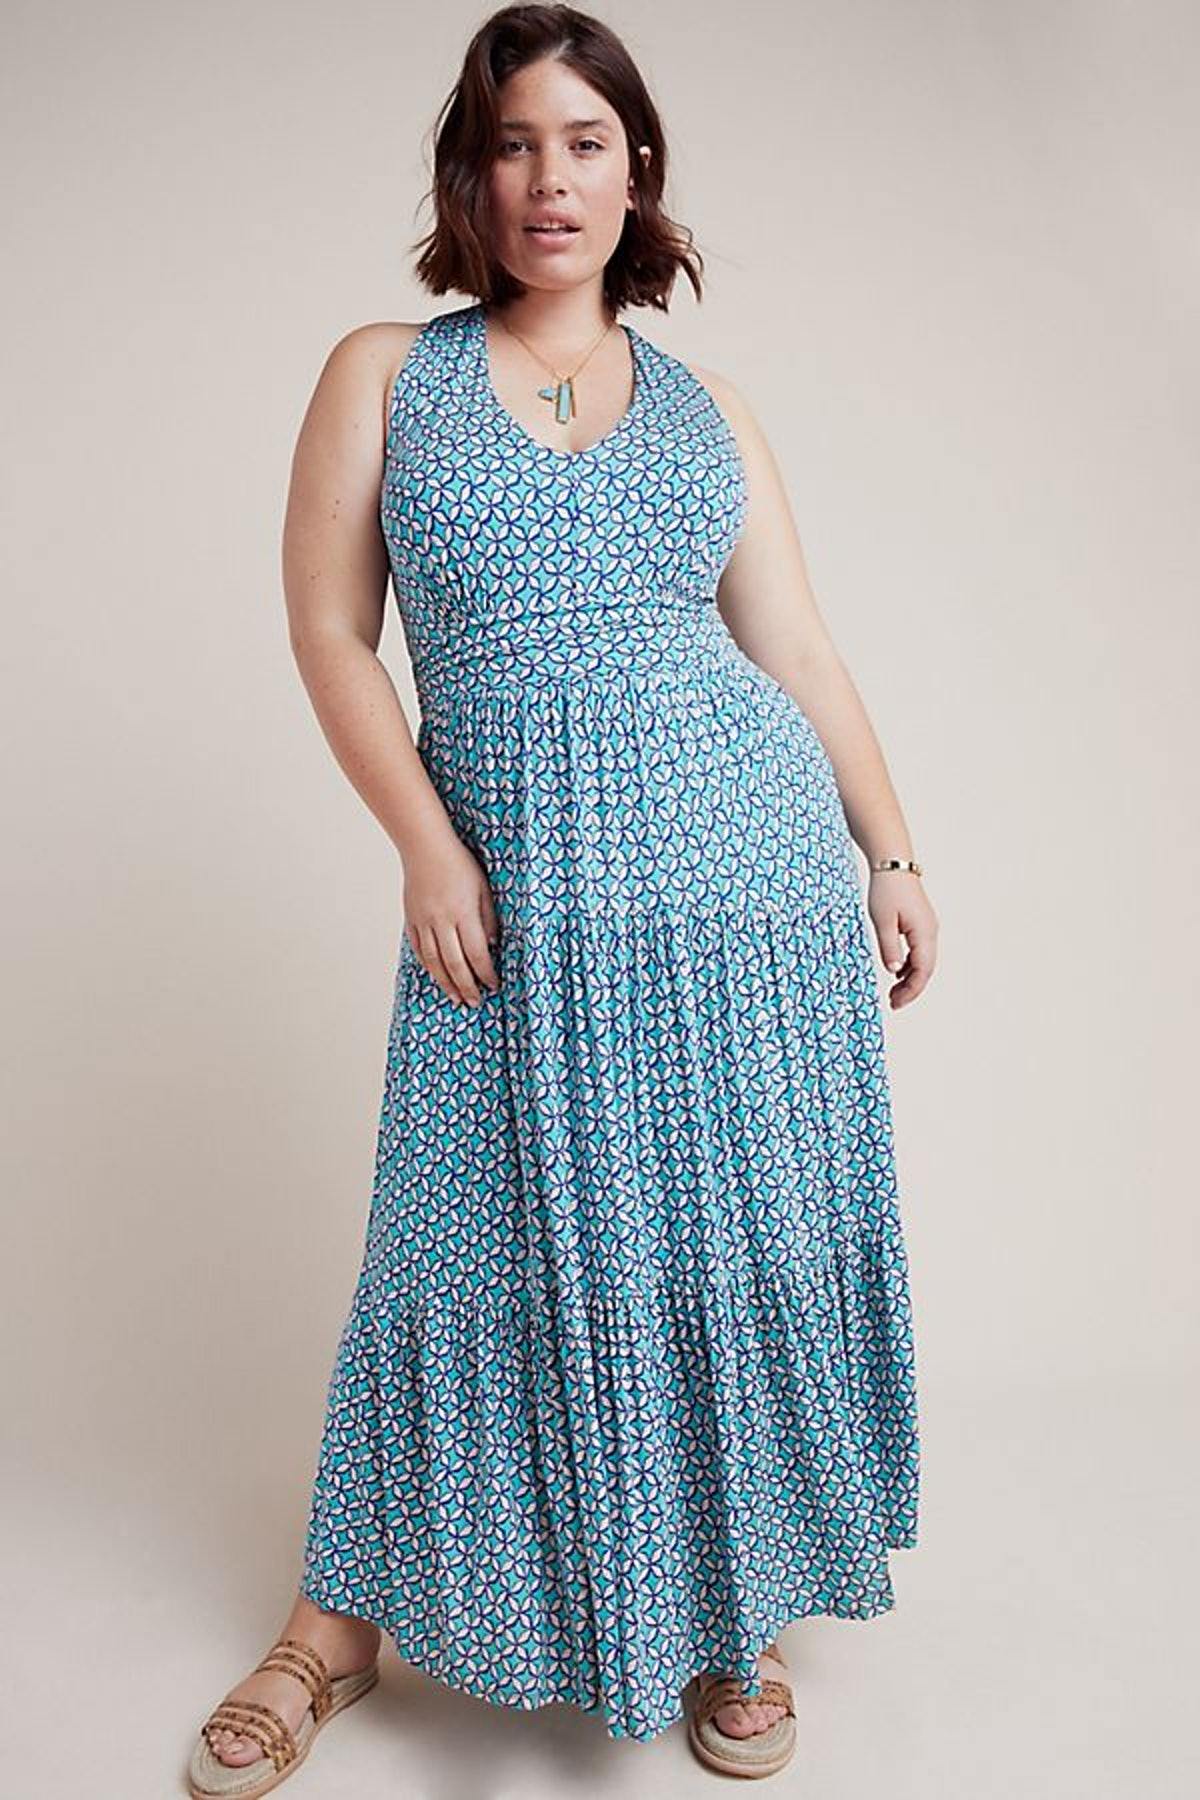 Mabel Halter Maxi Dress